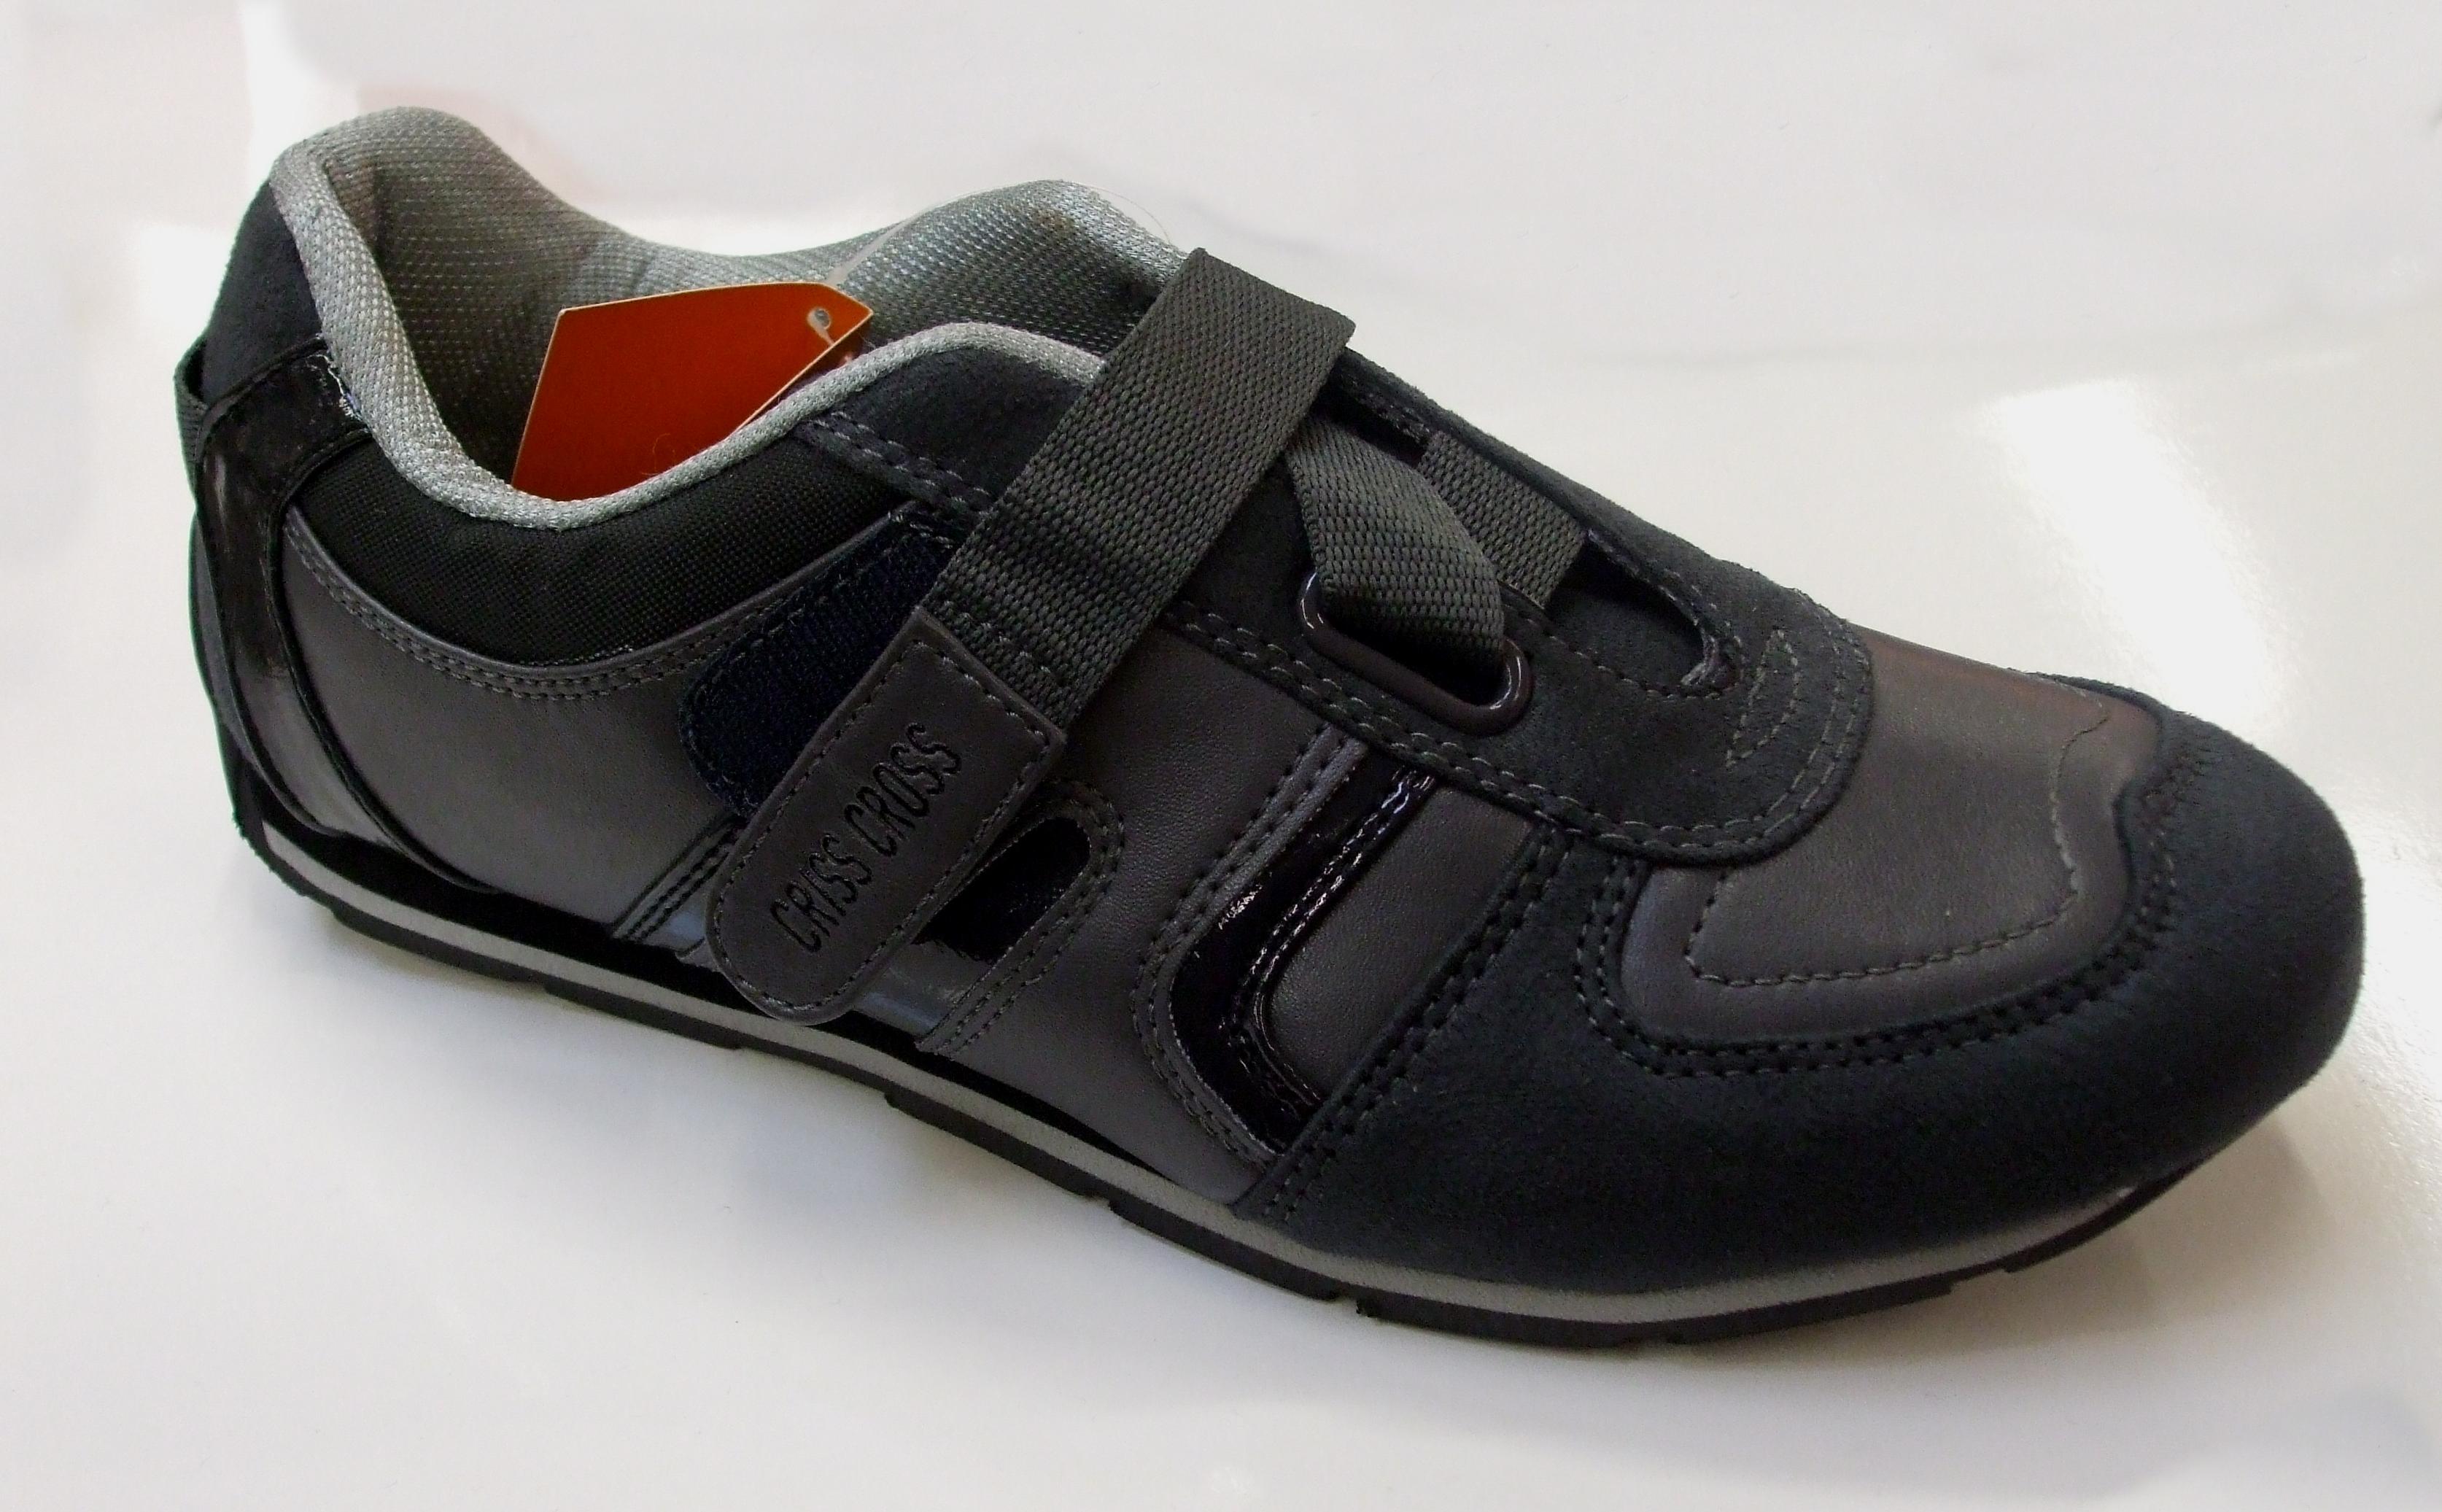 19cbe1665fcc File Shoelaces Velcro.JPG - Wikimedia Commons